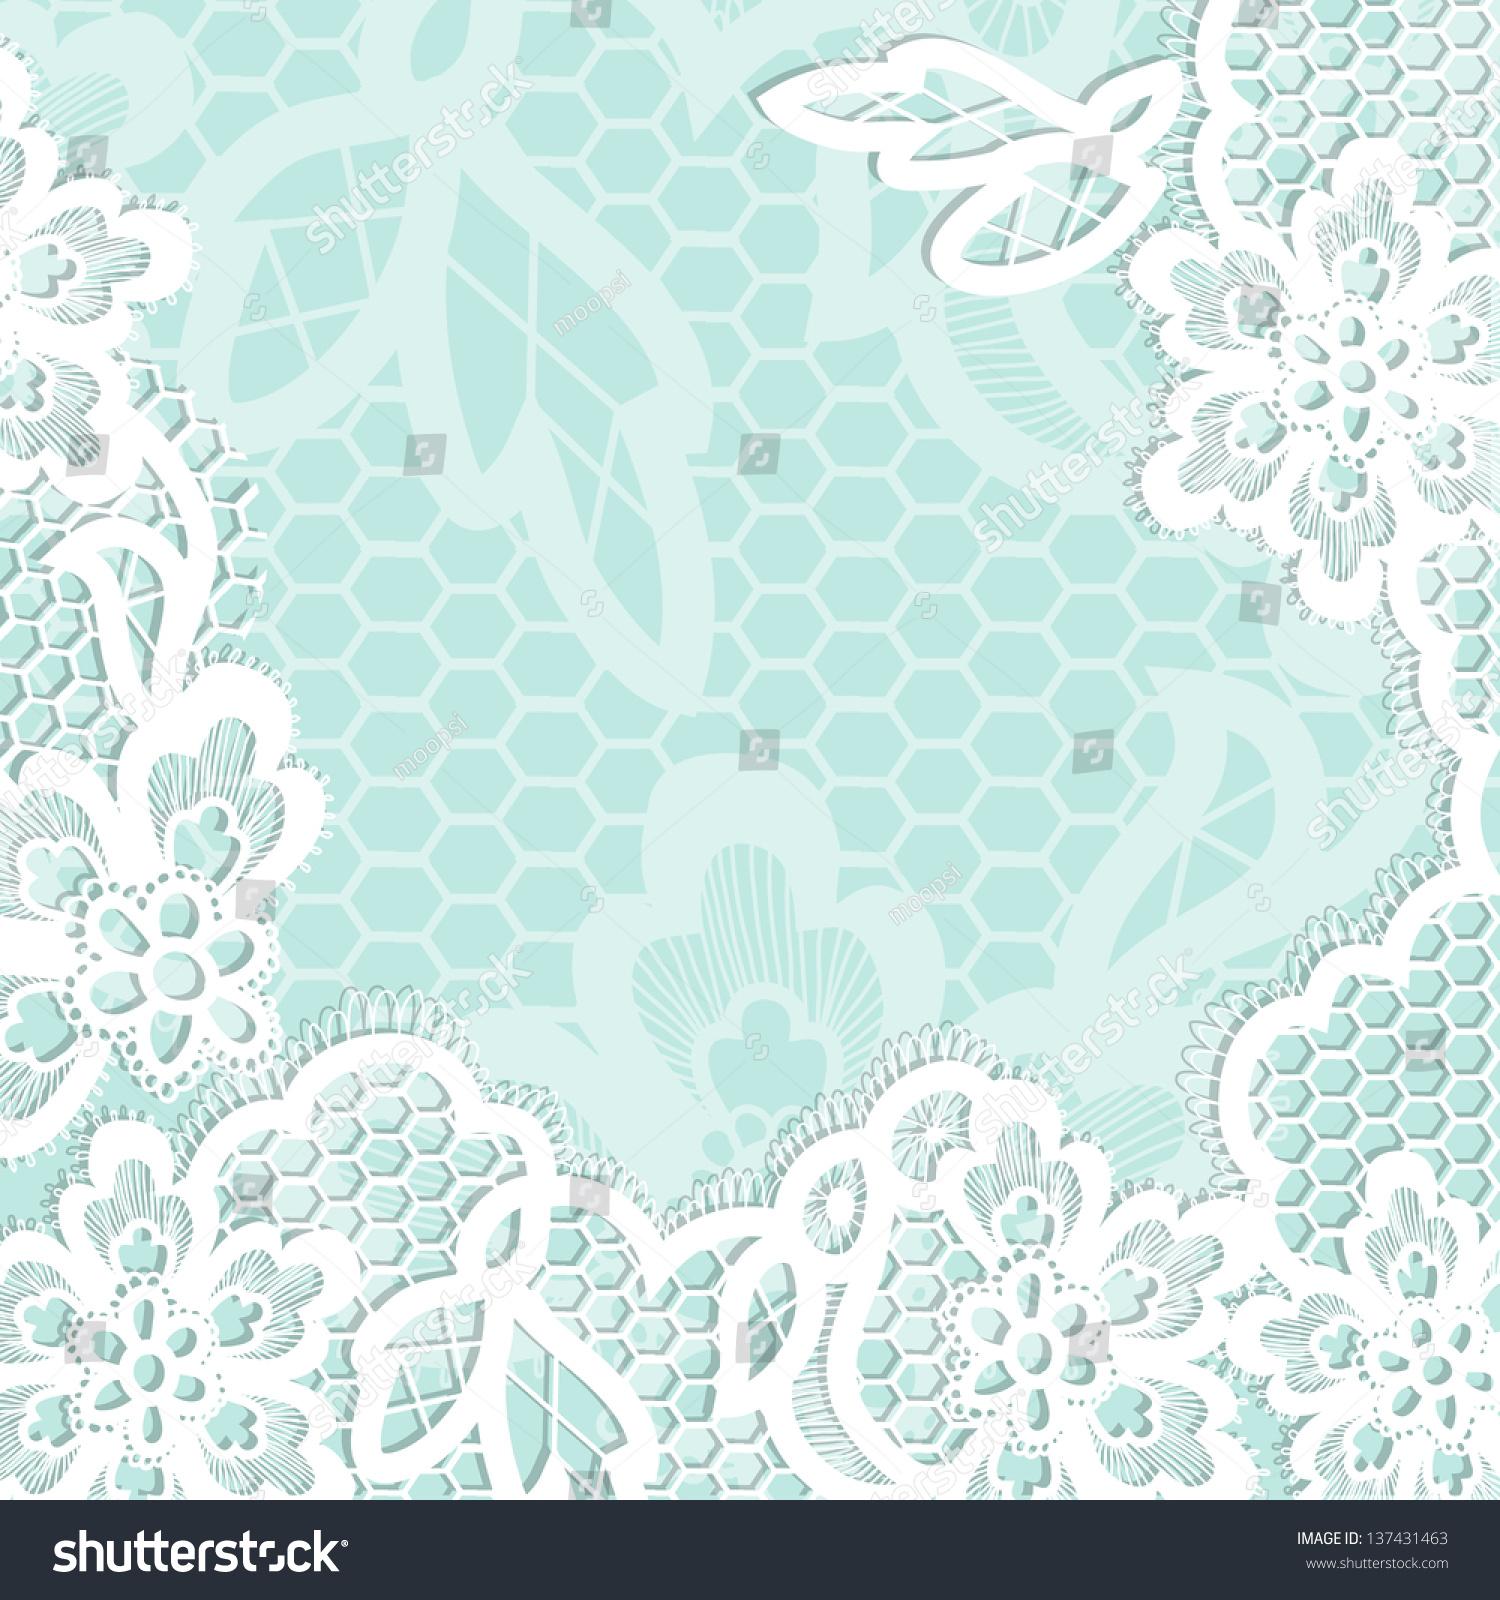 tiffany blue design wallpaper - photo #39